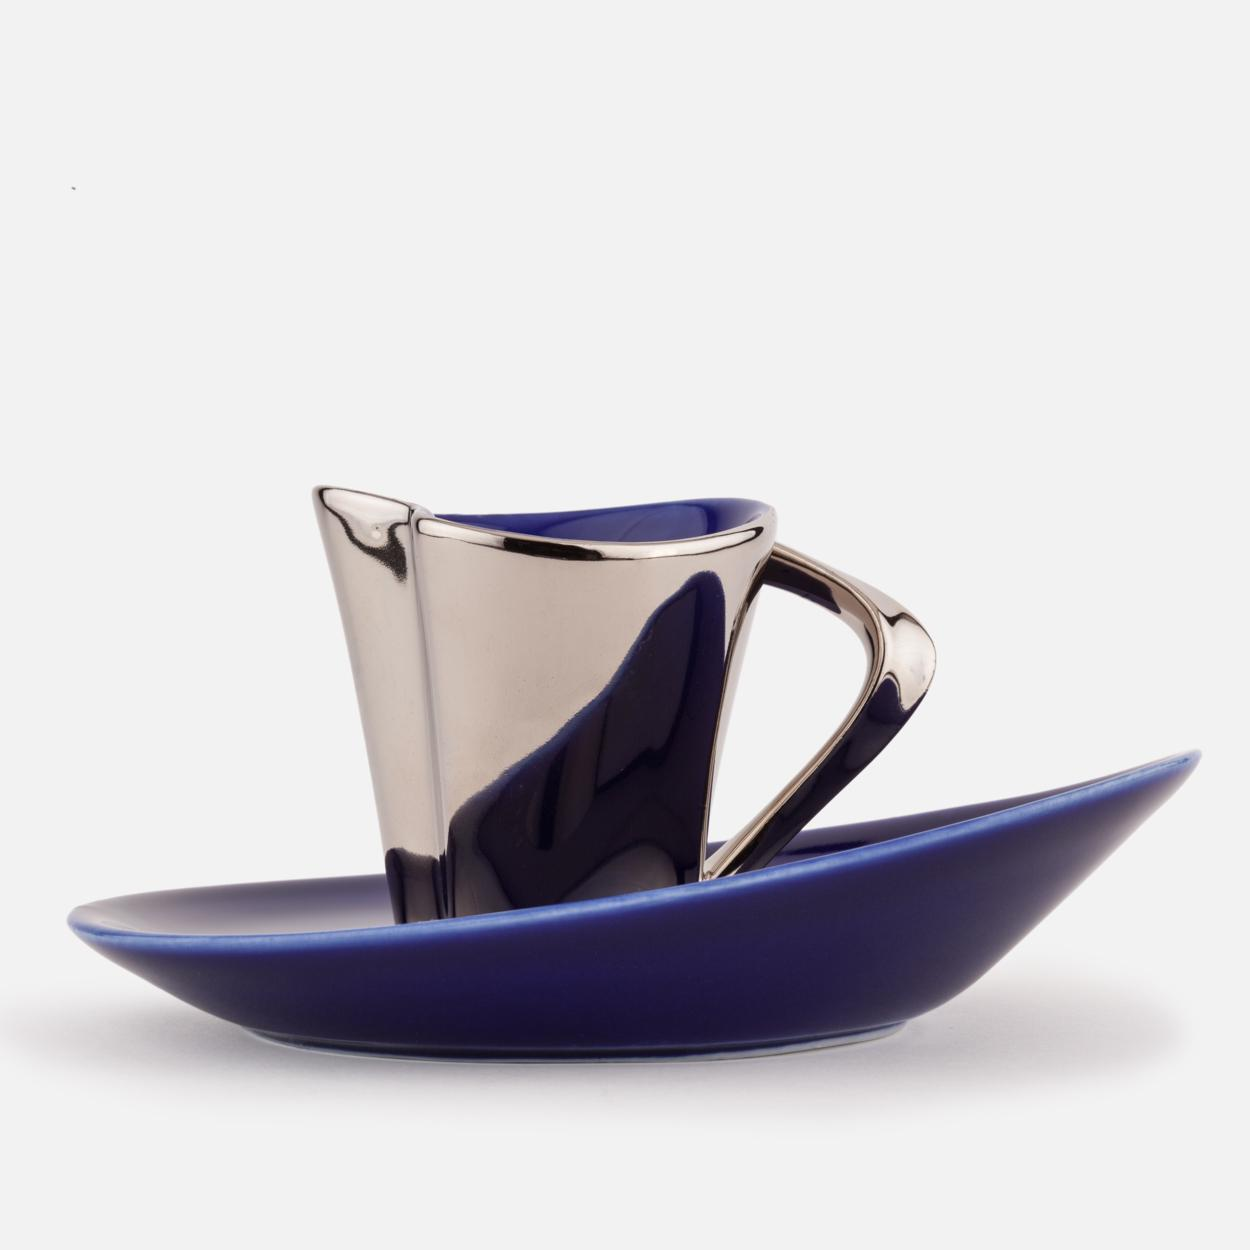 Taza de café y platillo de porcelana azul